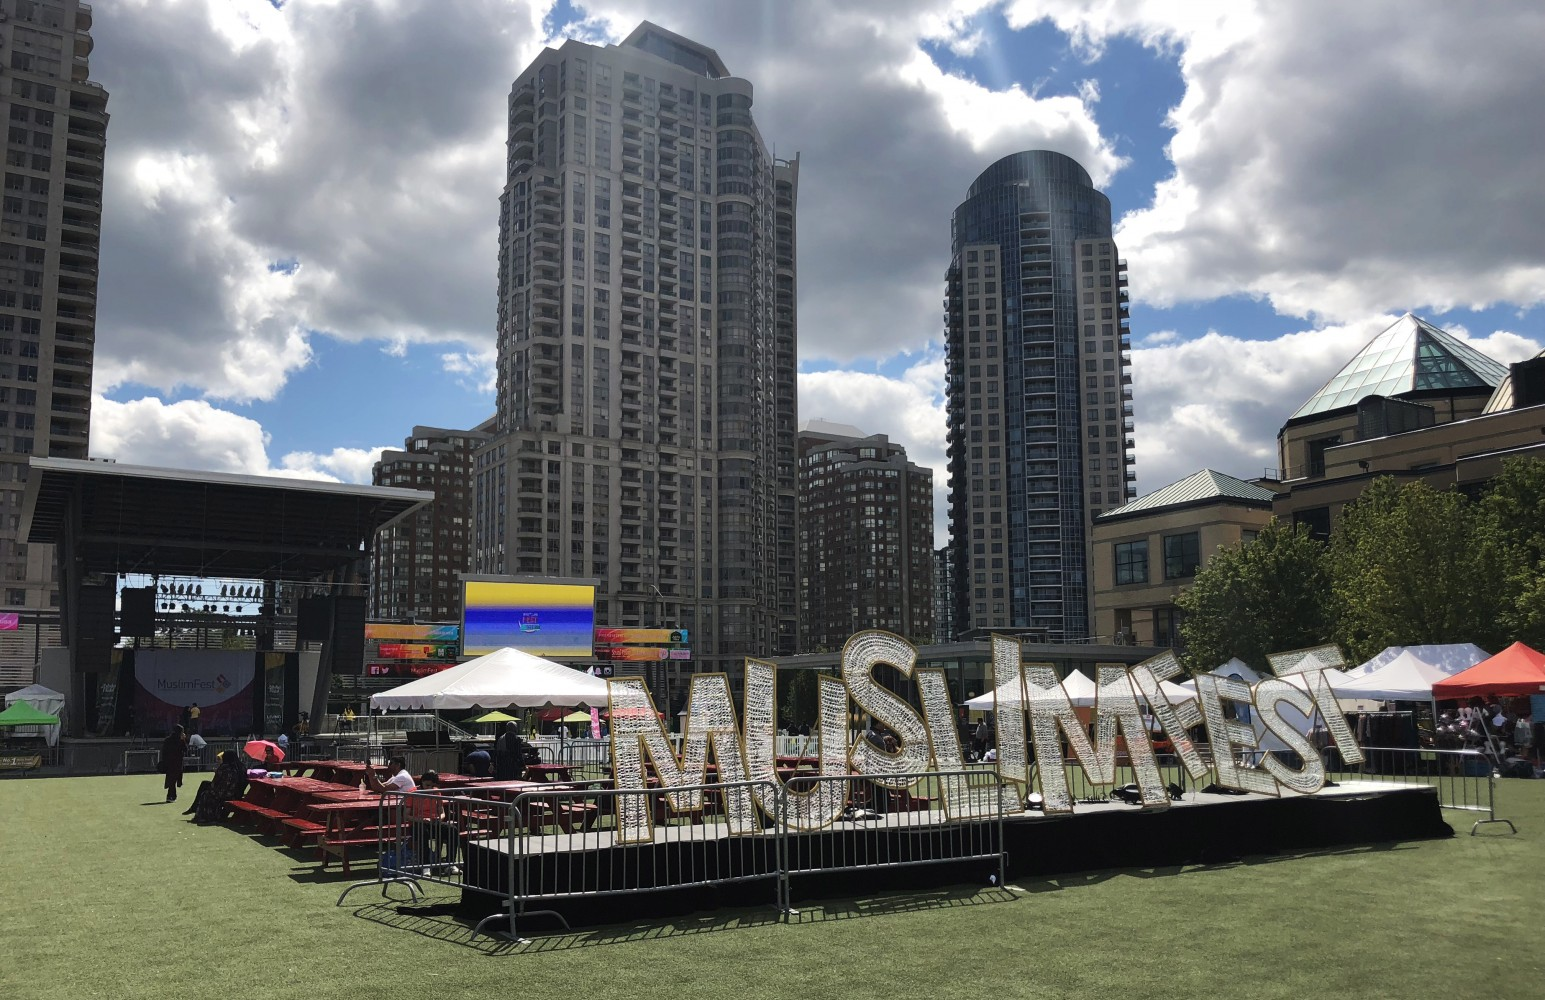 MuslimFest celebrates the 'lighter side' of Muslim culture